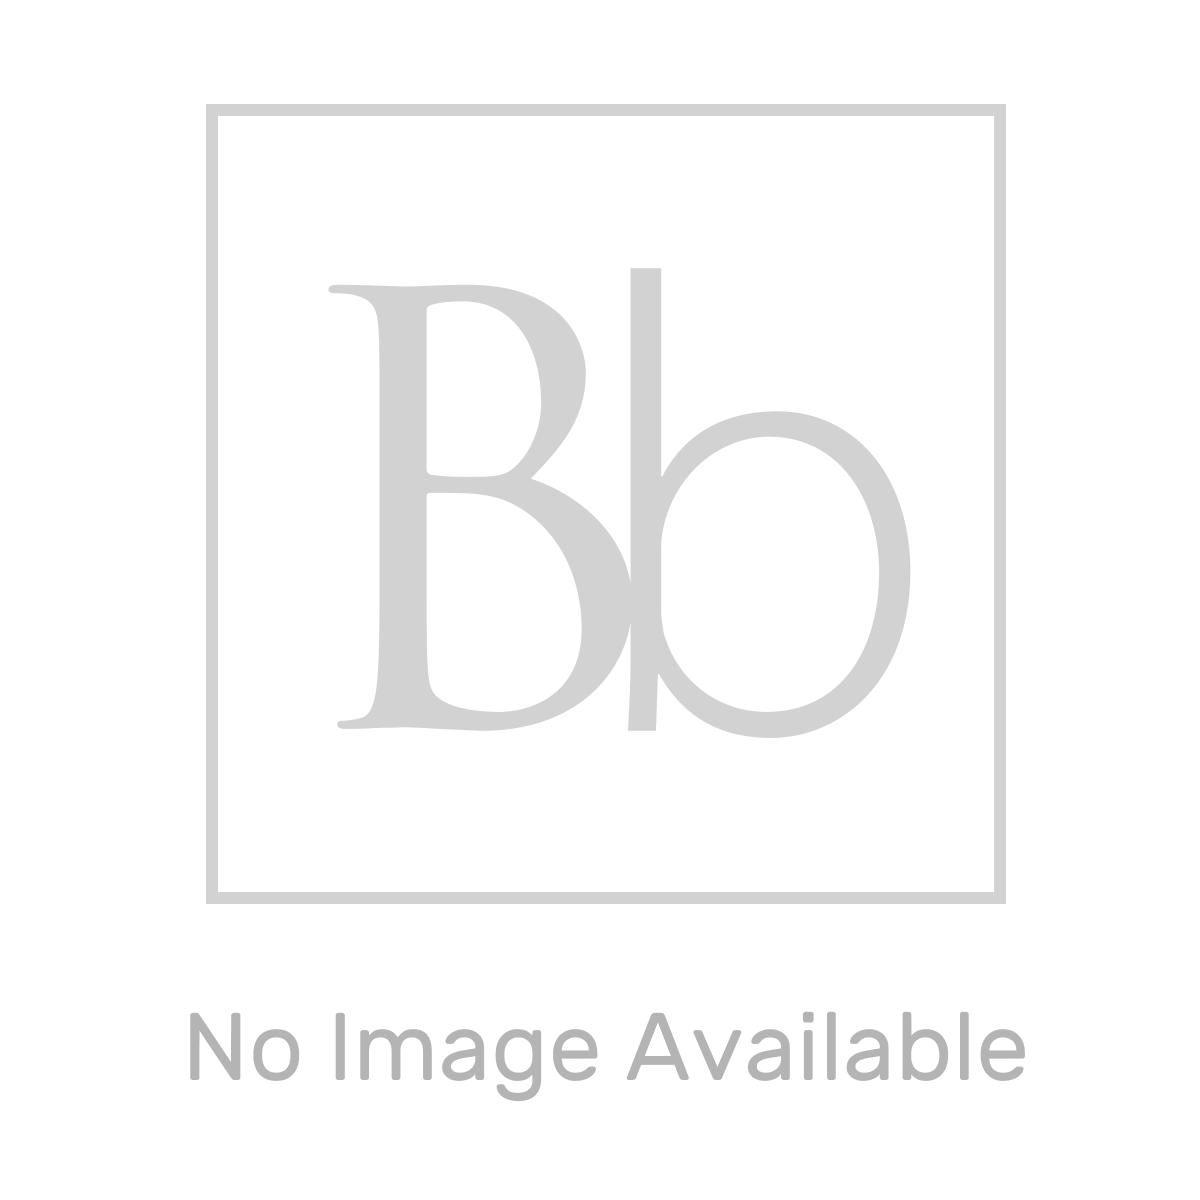 RAK Feeling White Square Single Outlet Thermostatic Shower Valve Measurements